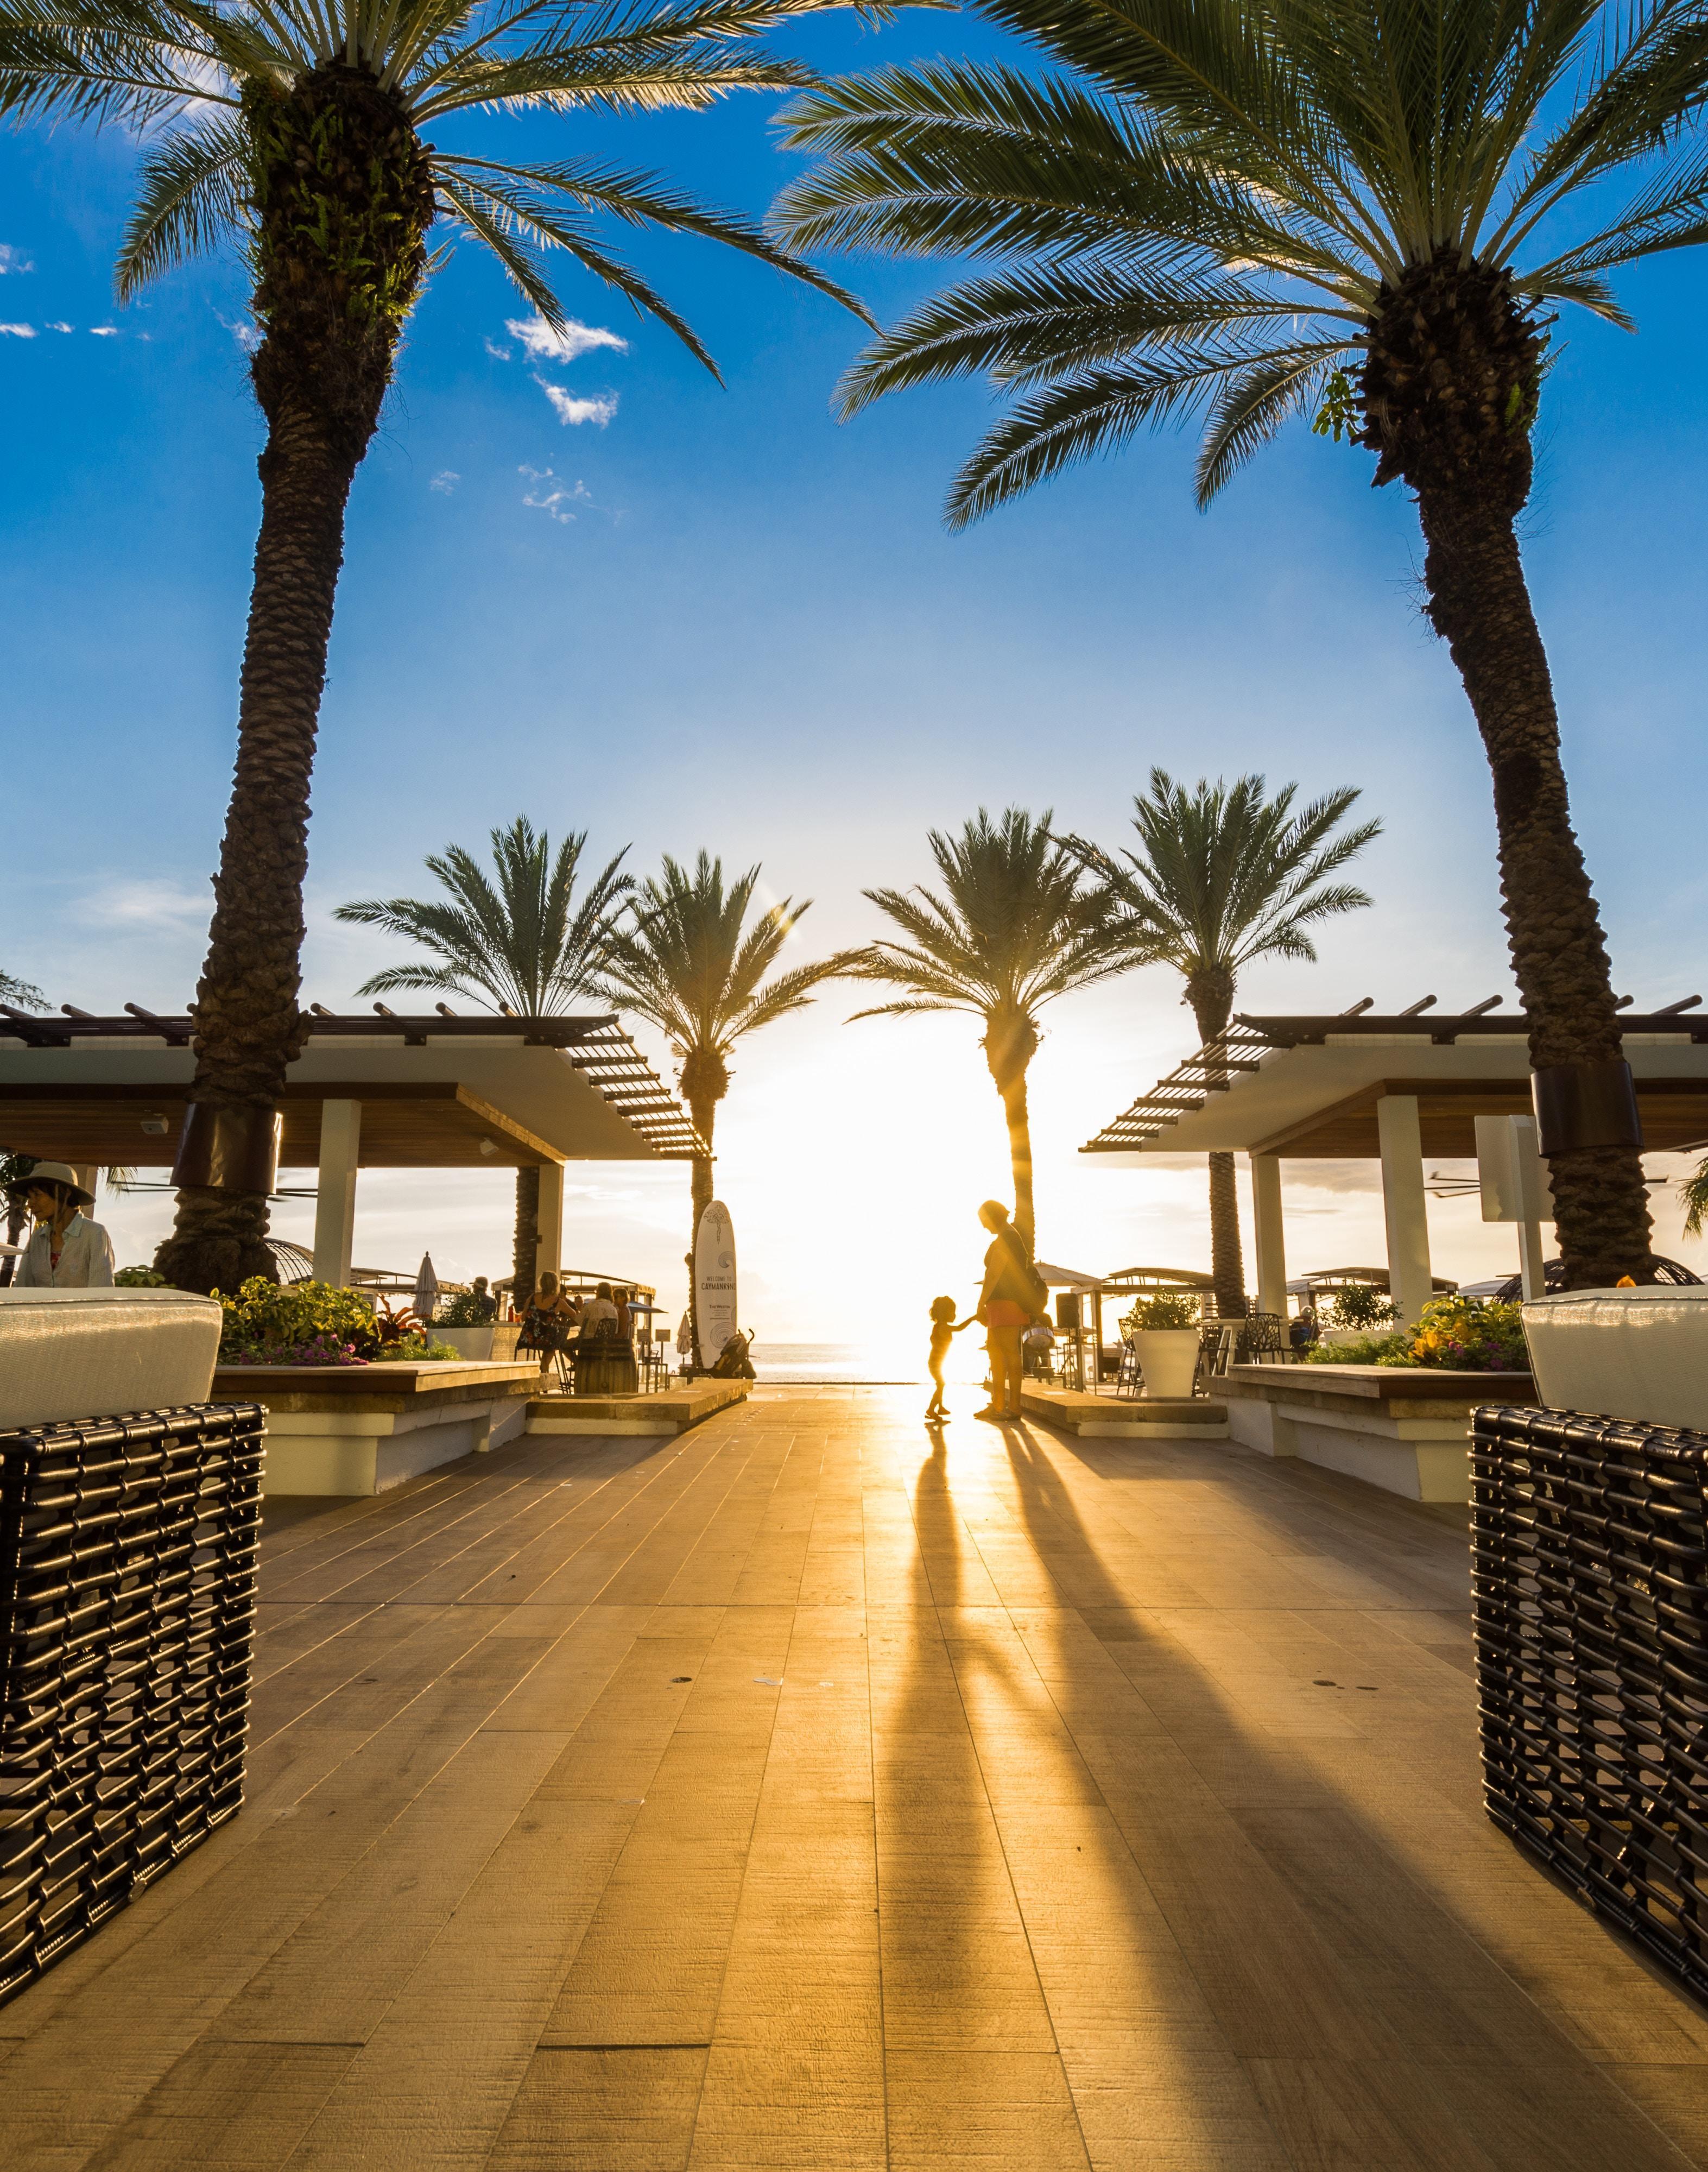 Grand Seas ResortHotel Sandos Playacar Beach Resort